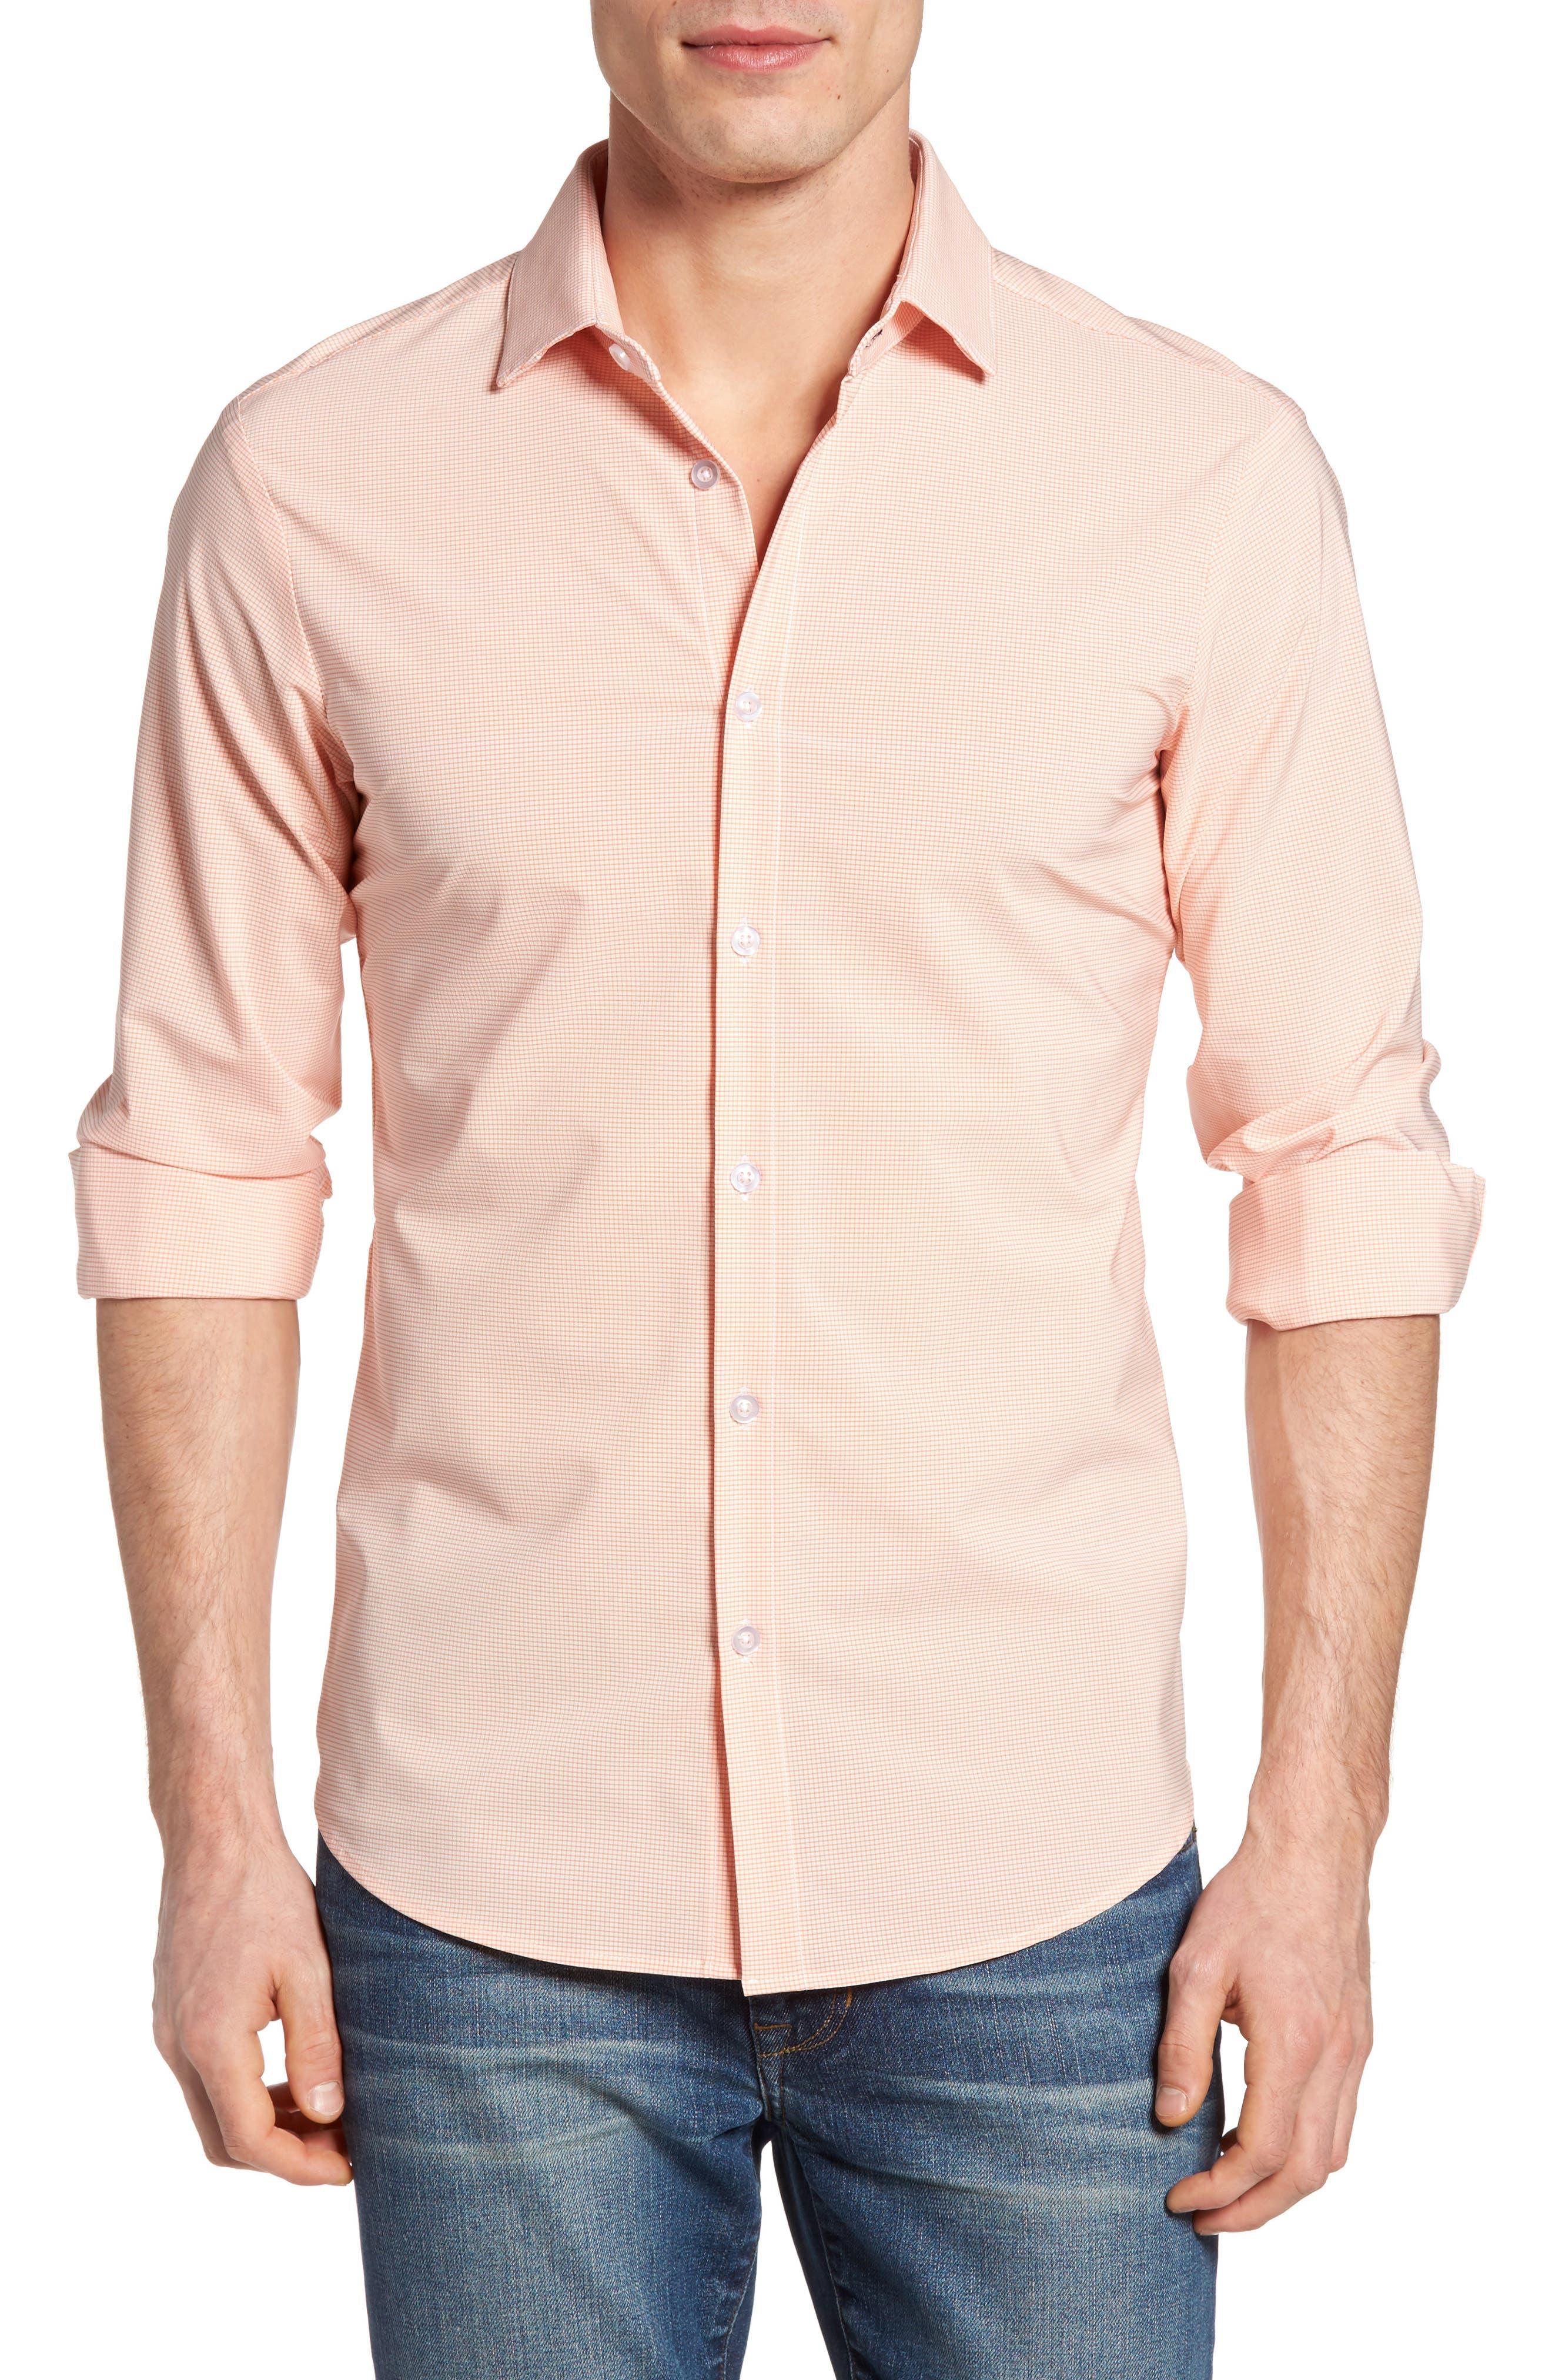 Charles Microcheck Performance Sport Shirt,                             Main thumbnail 1, color,                             Peach